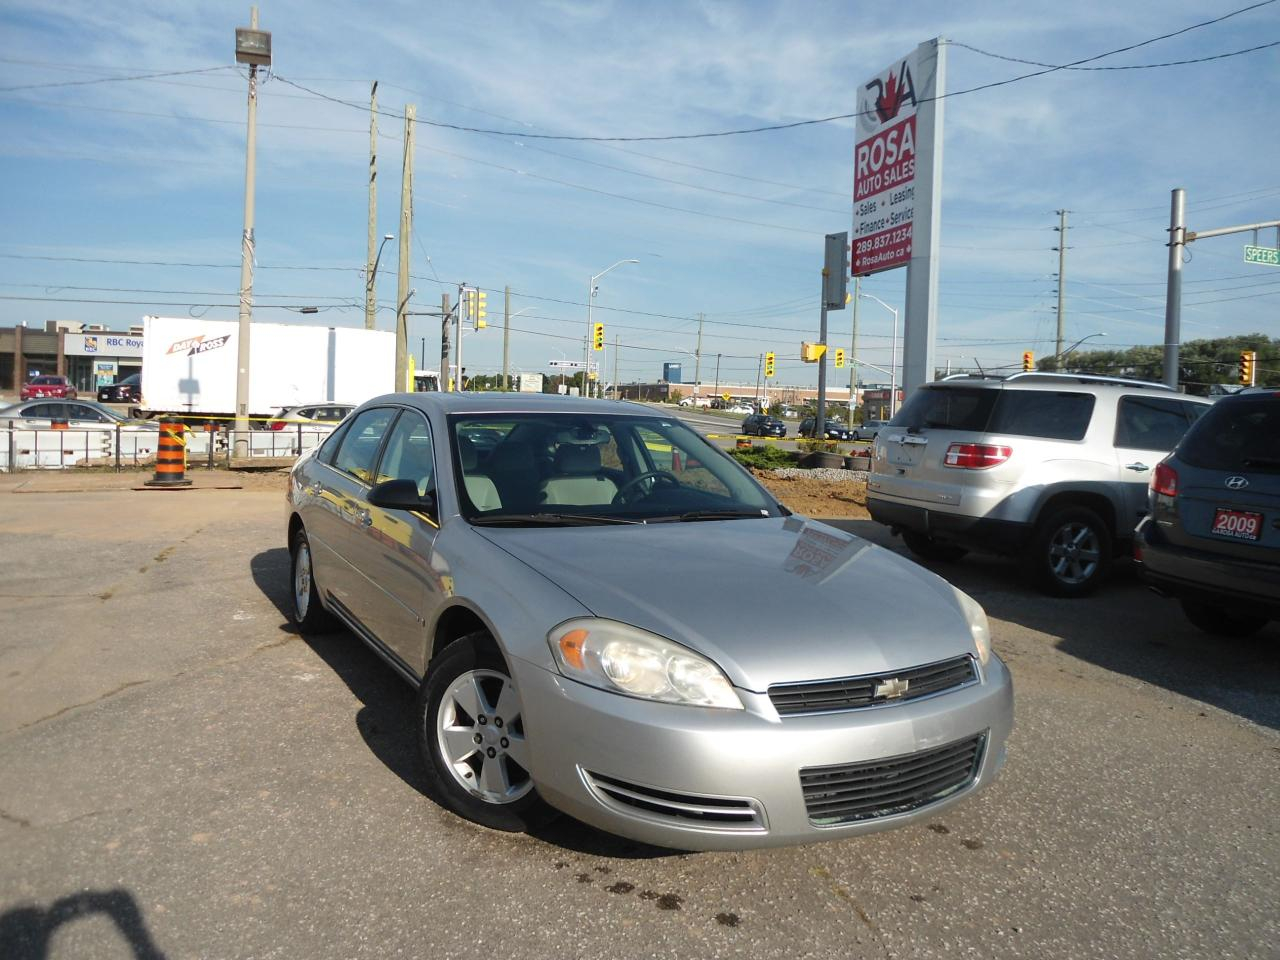 2006 Chevrolet Impala AUTO SUNROOF,ALLOY WHEELS,NEW REAR BRAKES ( PADS &